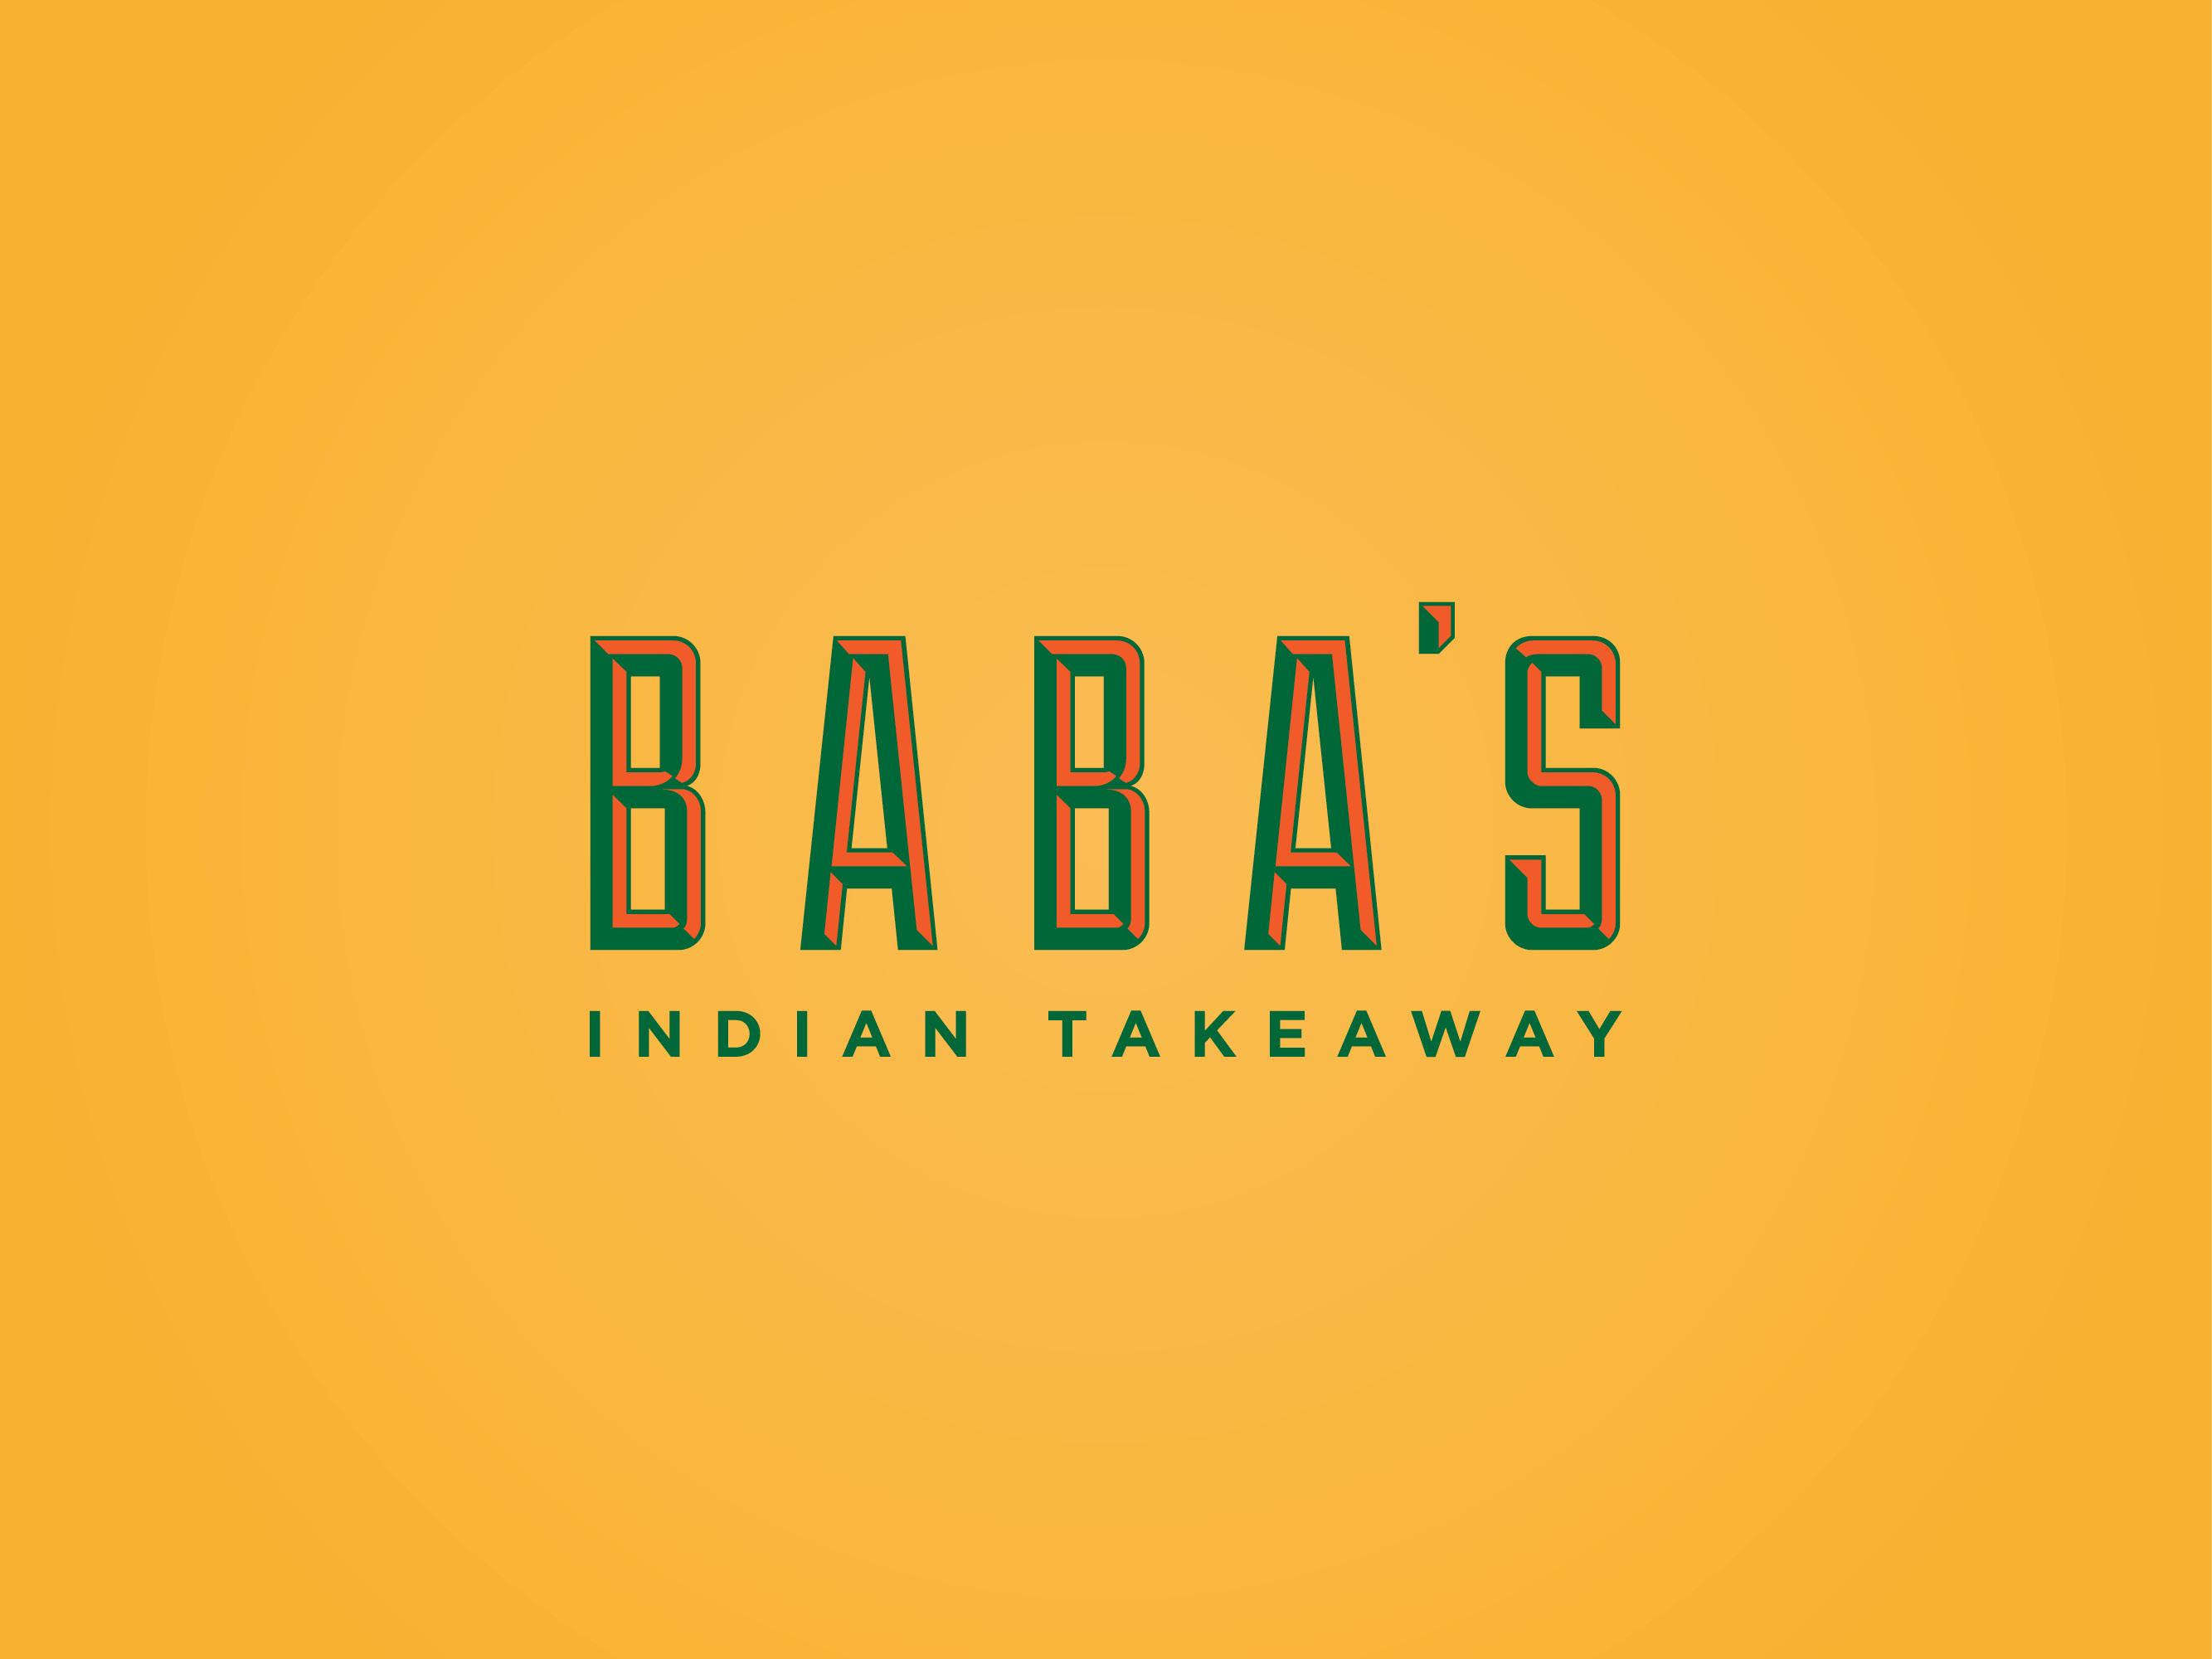 Babas indian takeaway brand identity and menu design